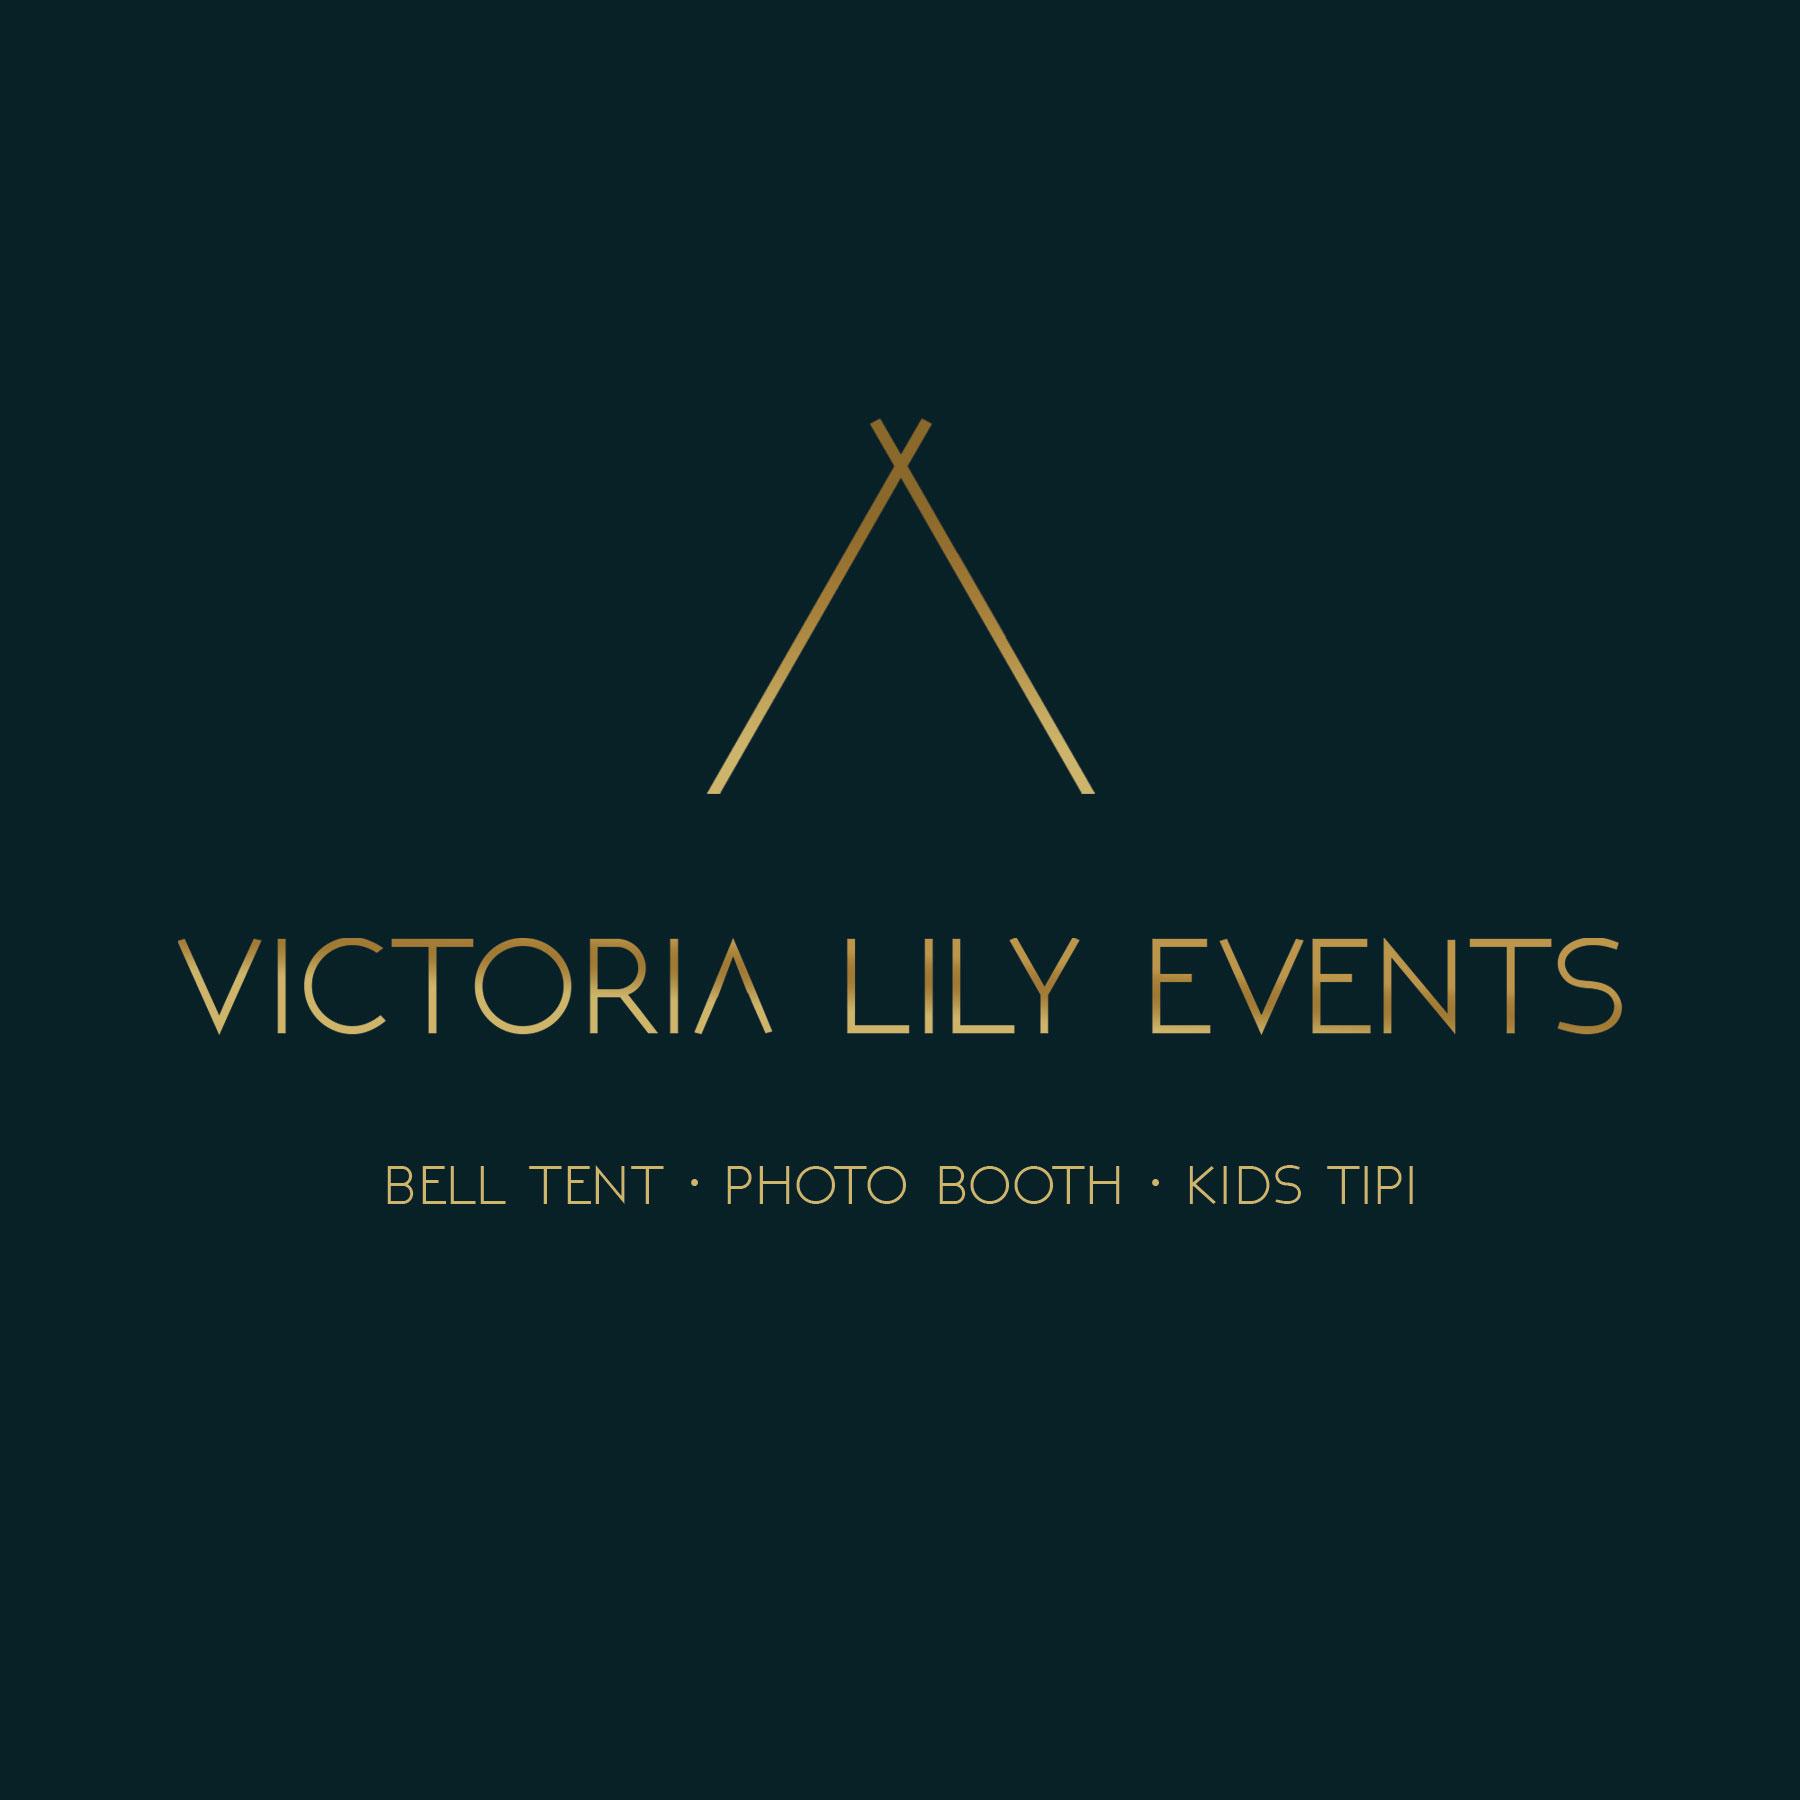 Victoria Lily Events